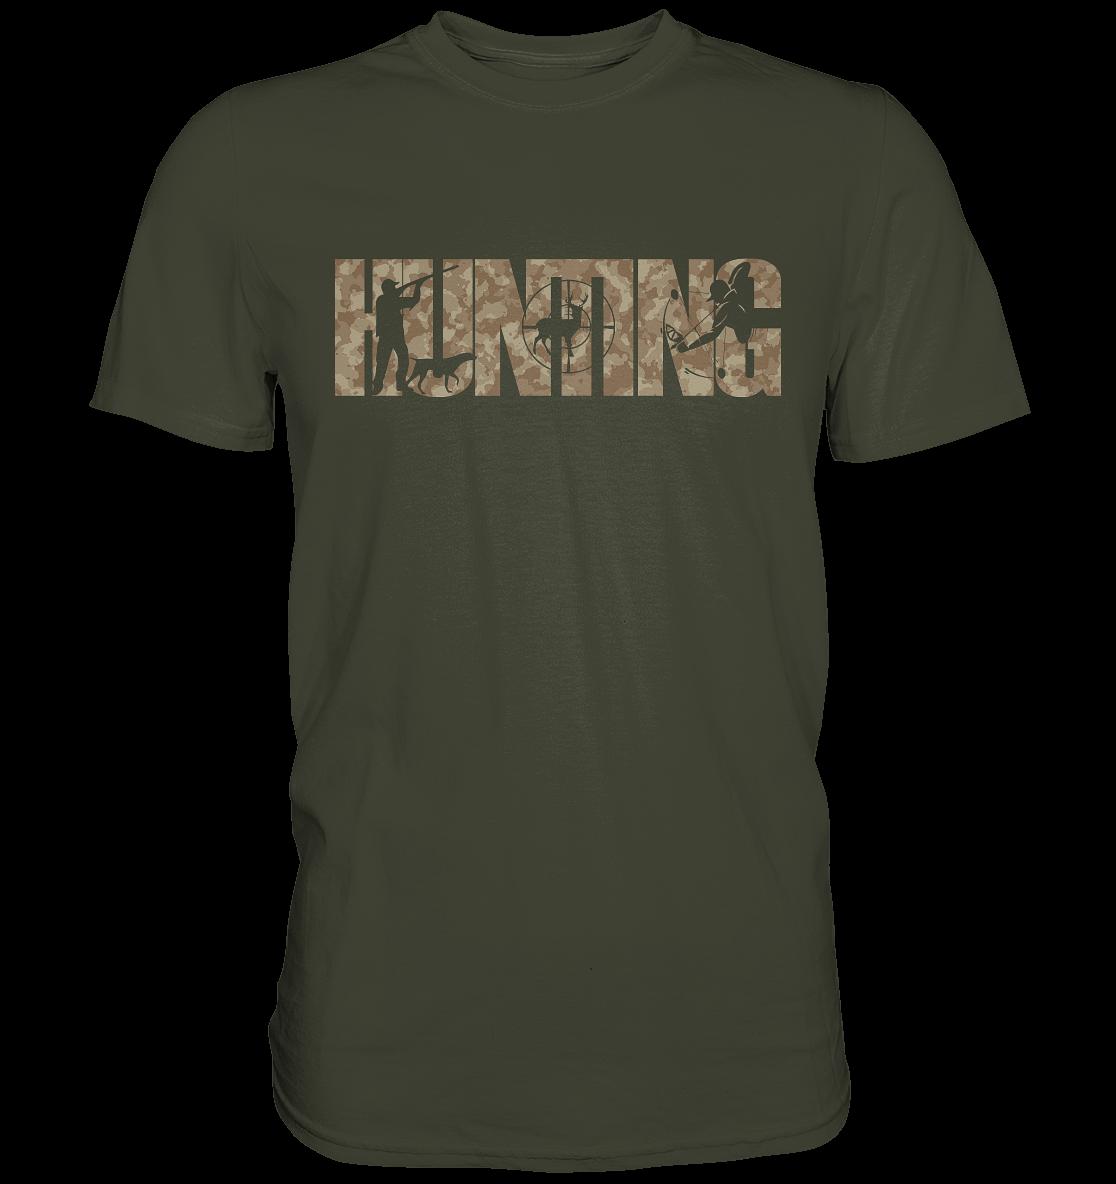 t-shirt_hunting_jagen_camo_sand_khaki